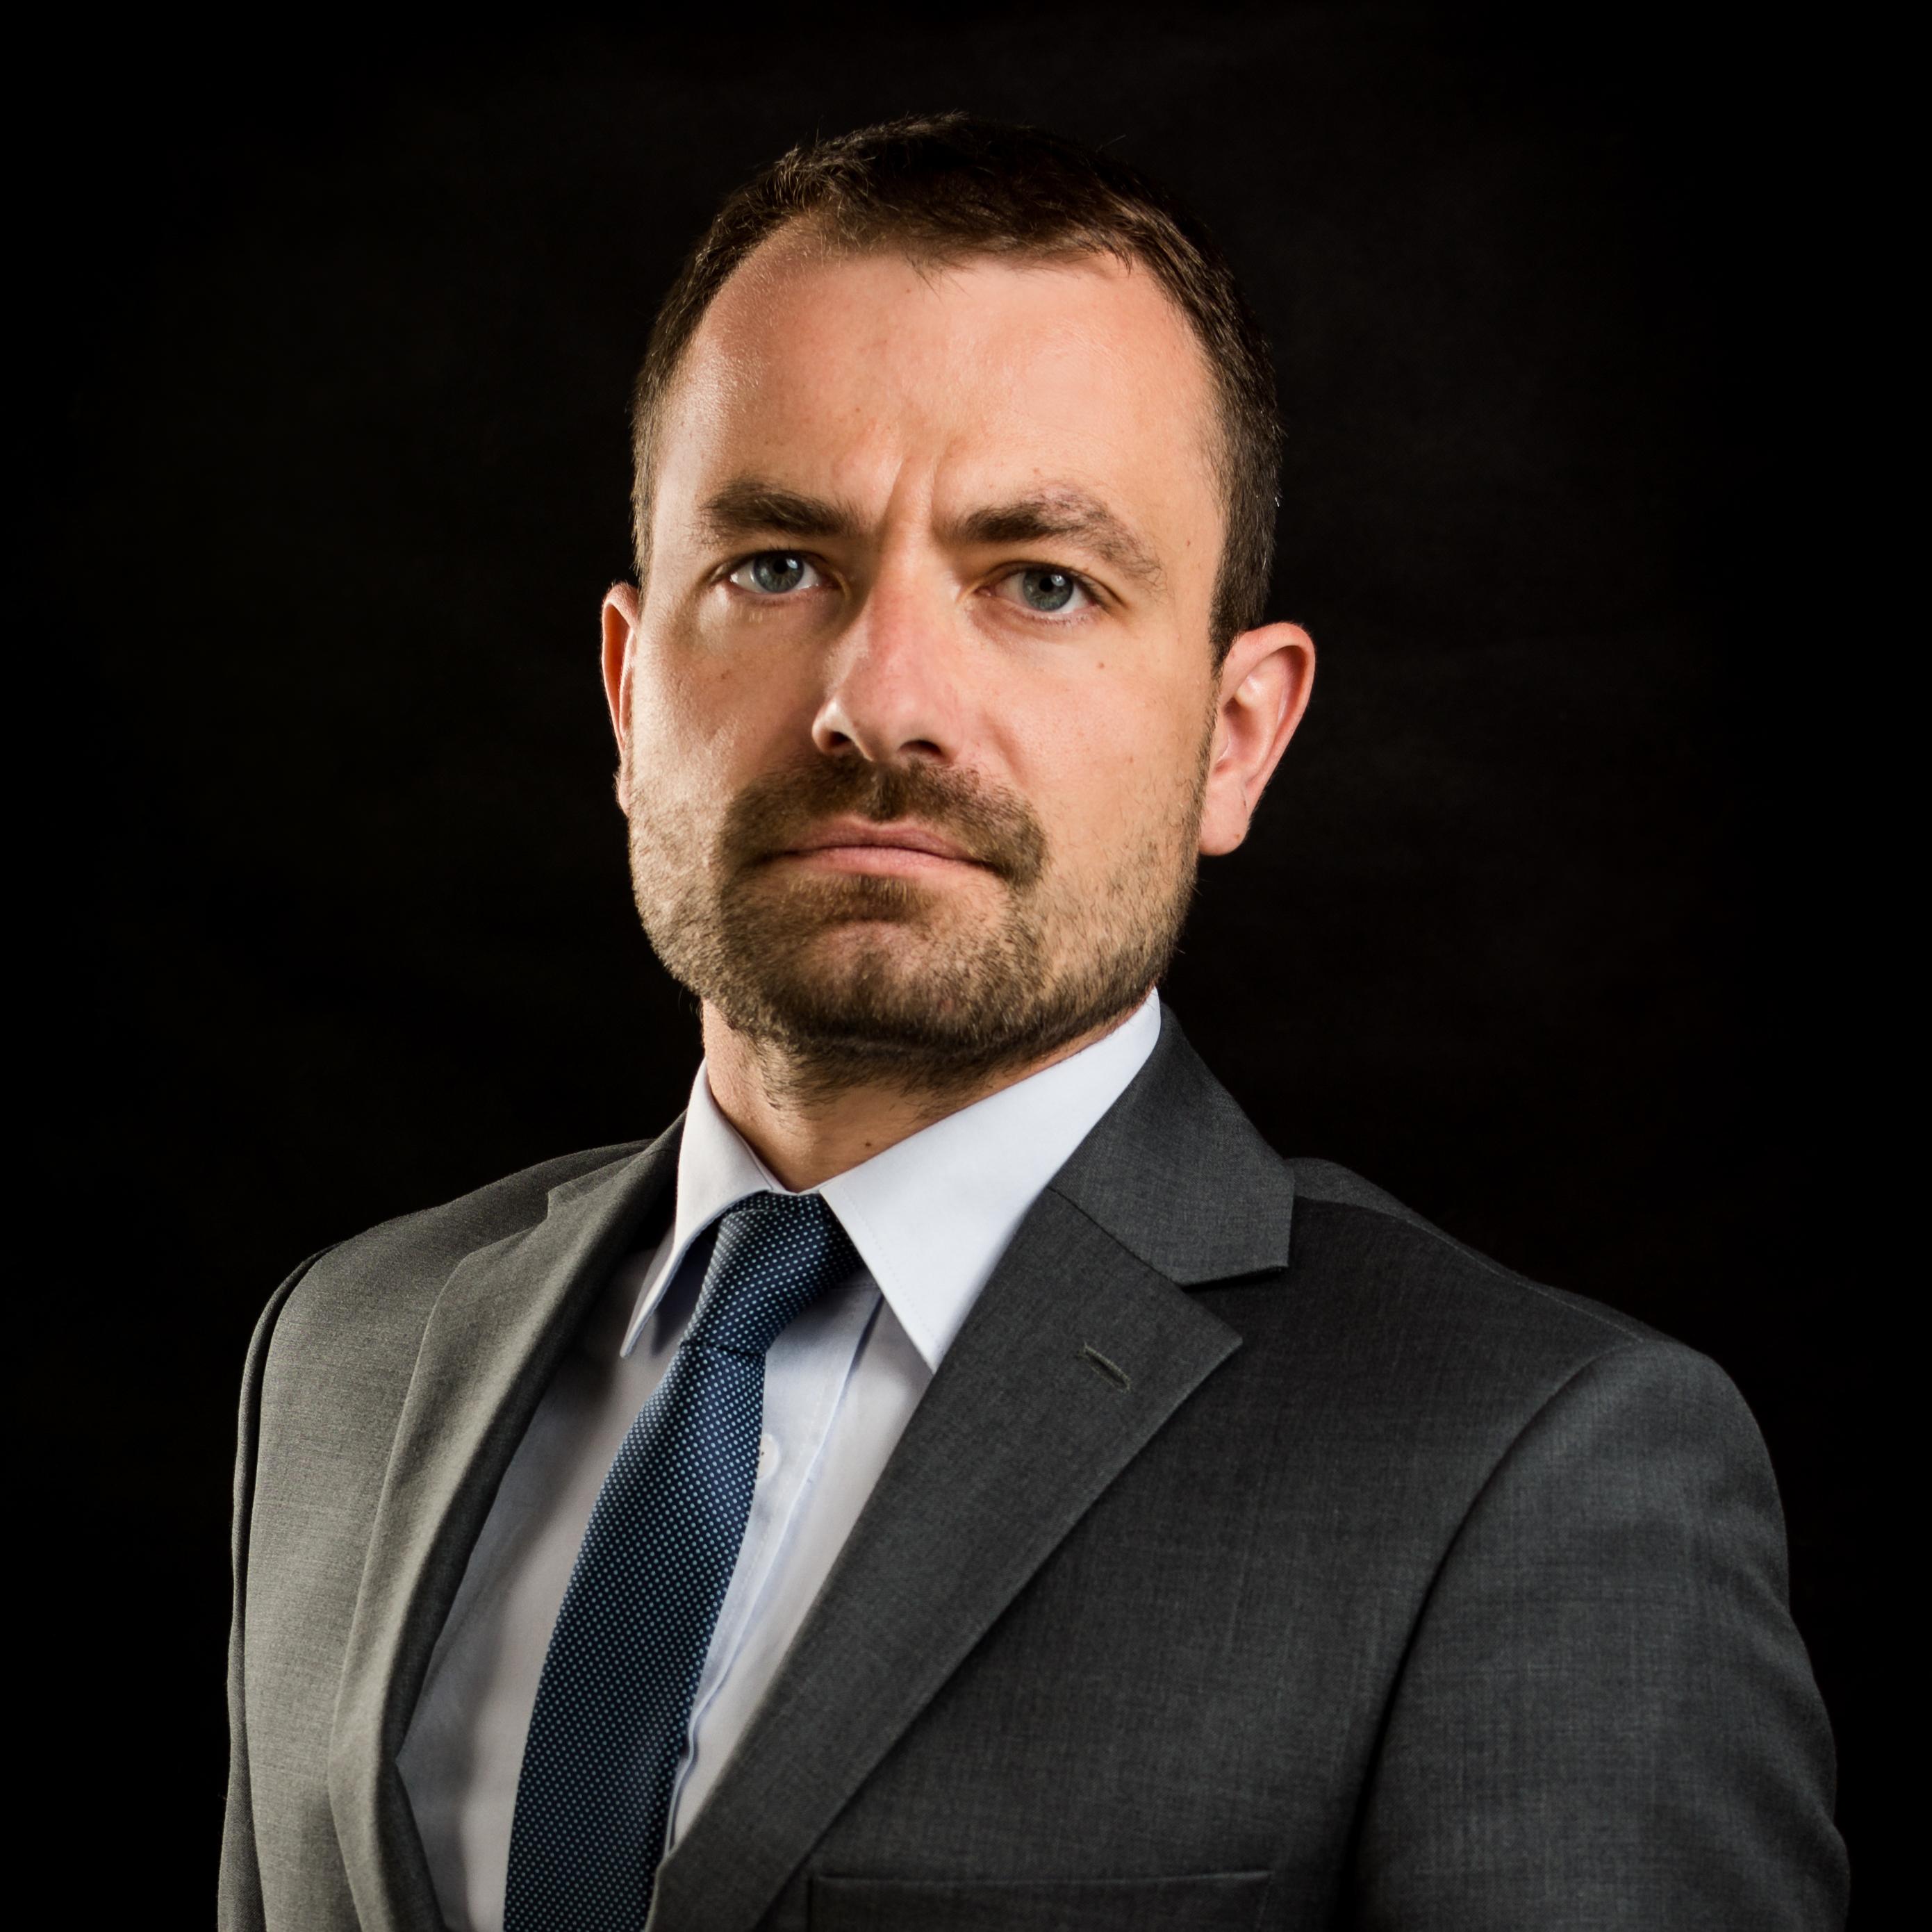 Dawid Michalak